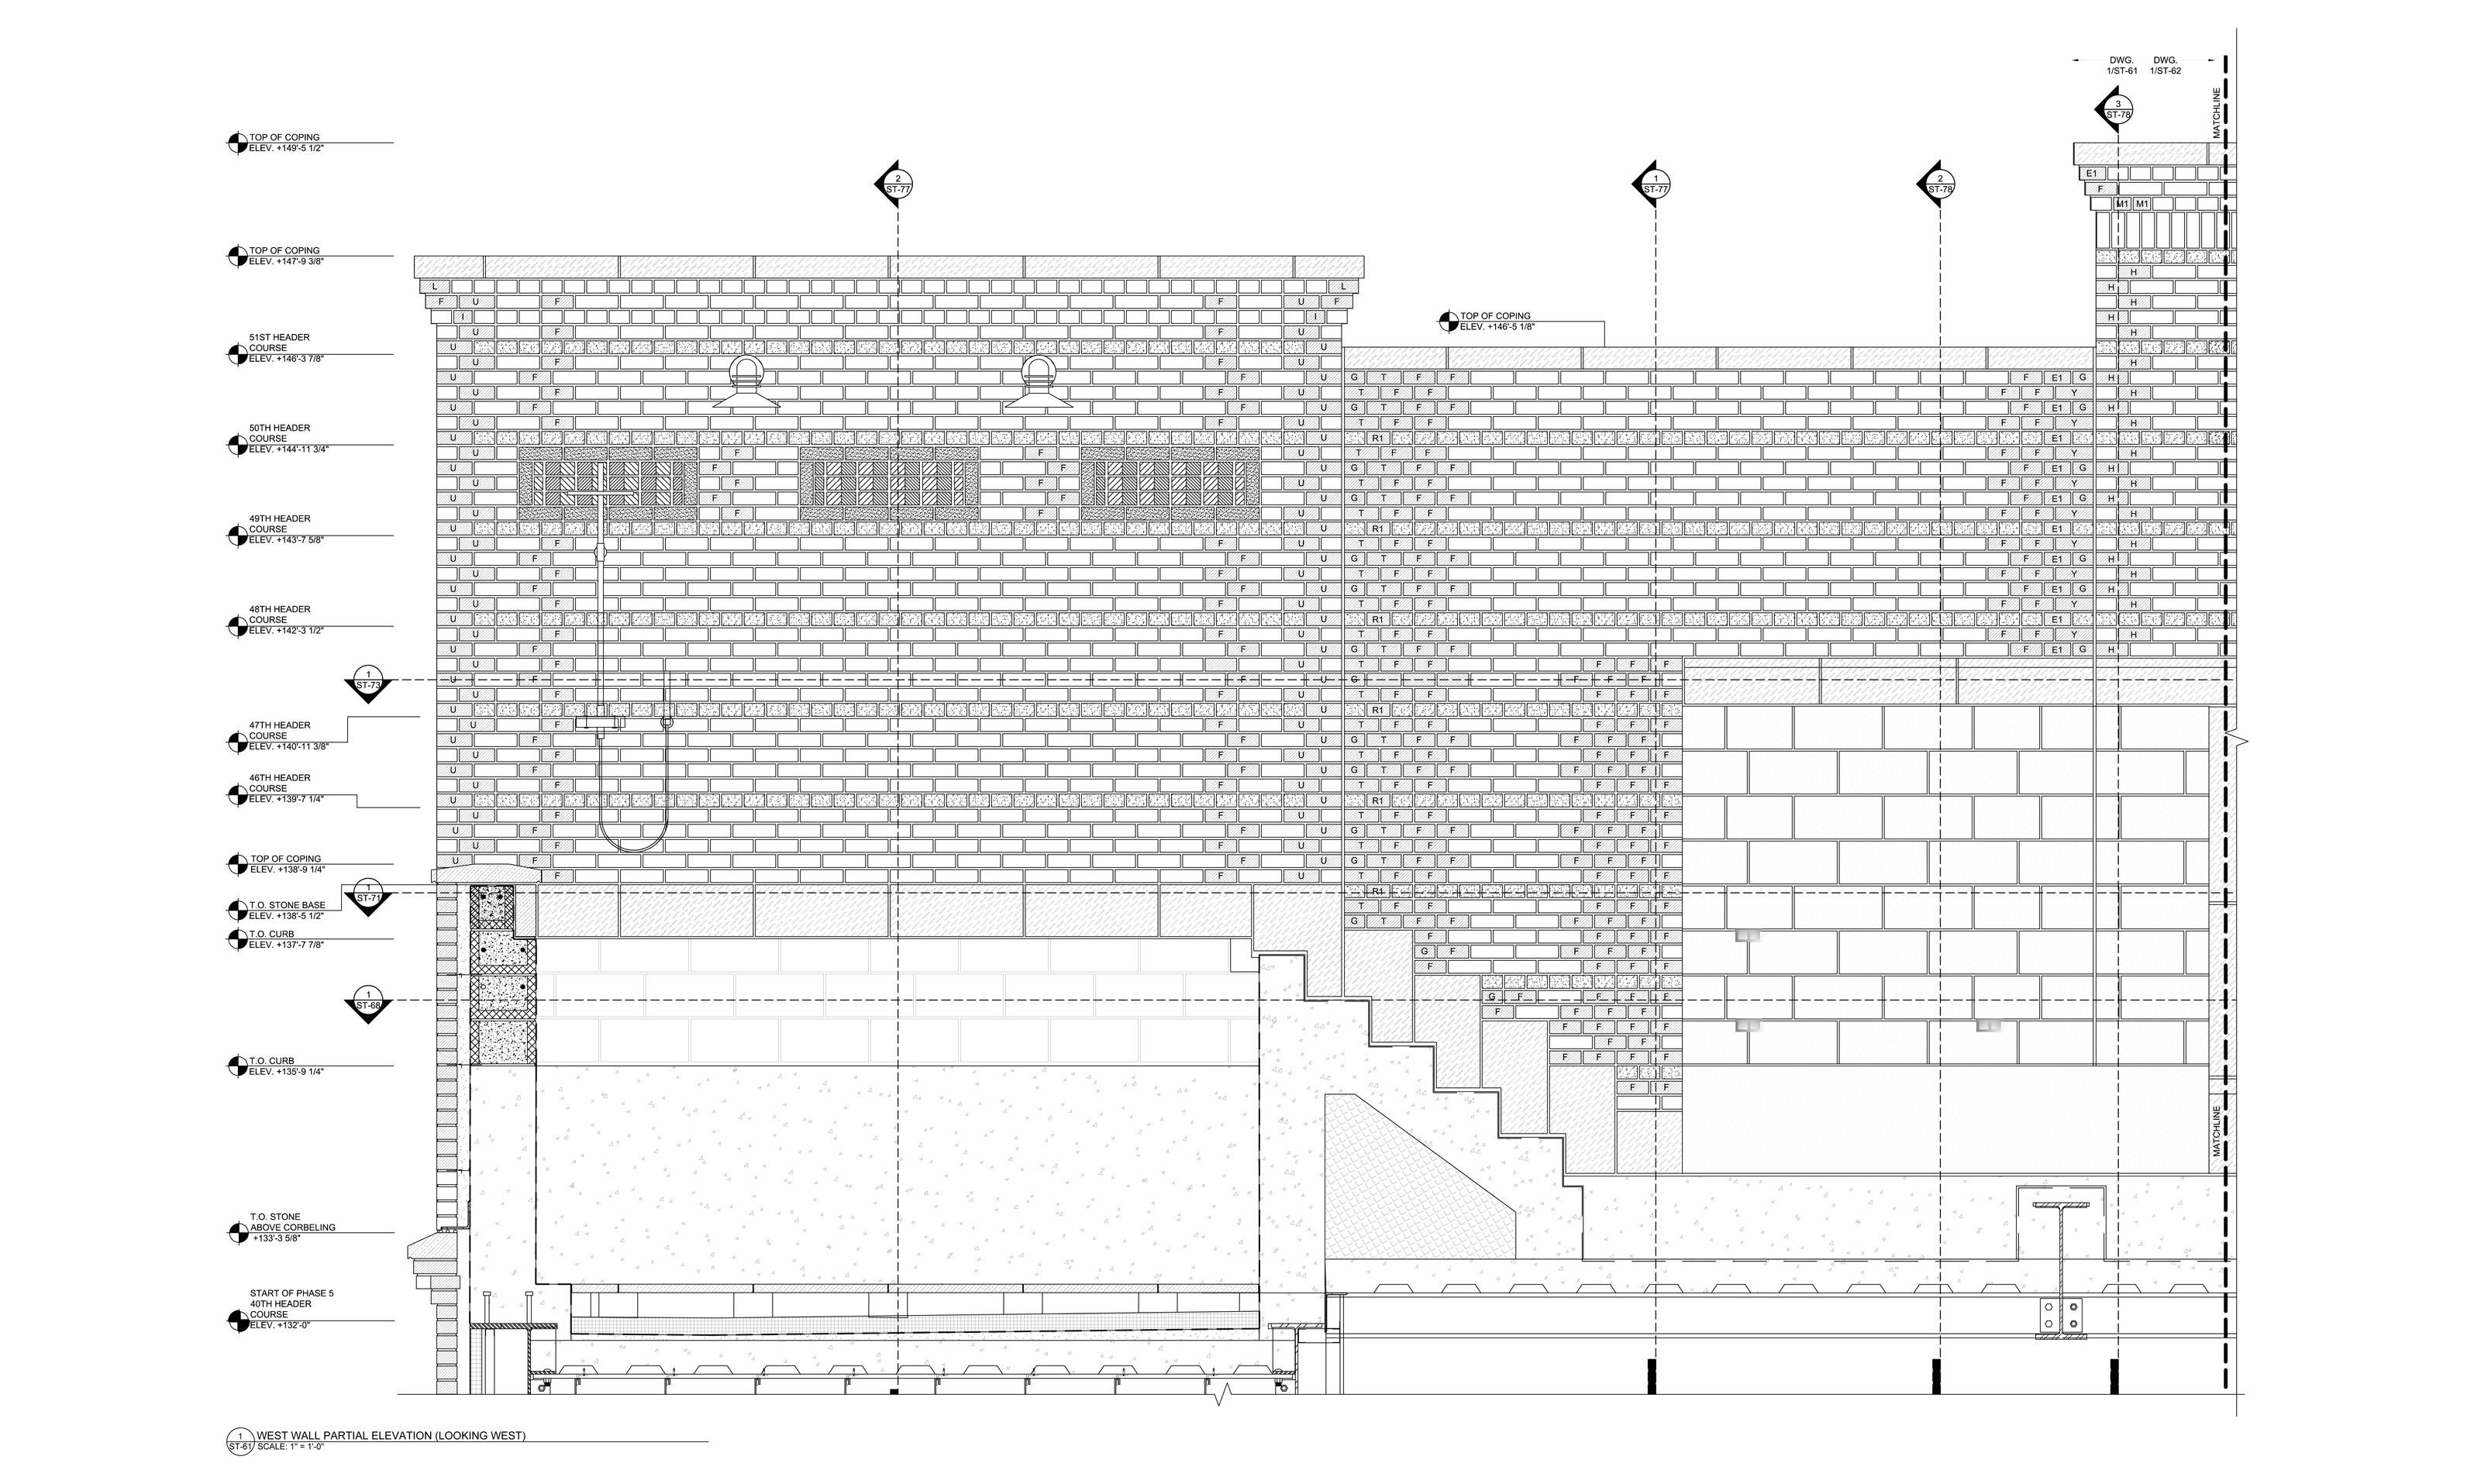 Shop Drawings Drafting For Masons Millworkers More Draftermax Hvac Drawing Samples Masonry Sample 1